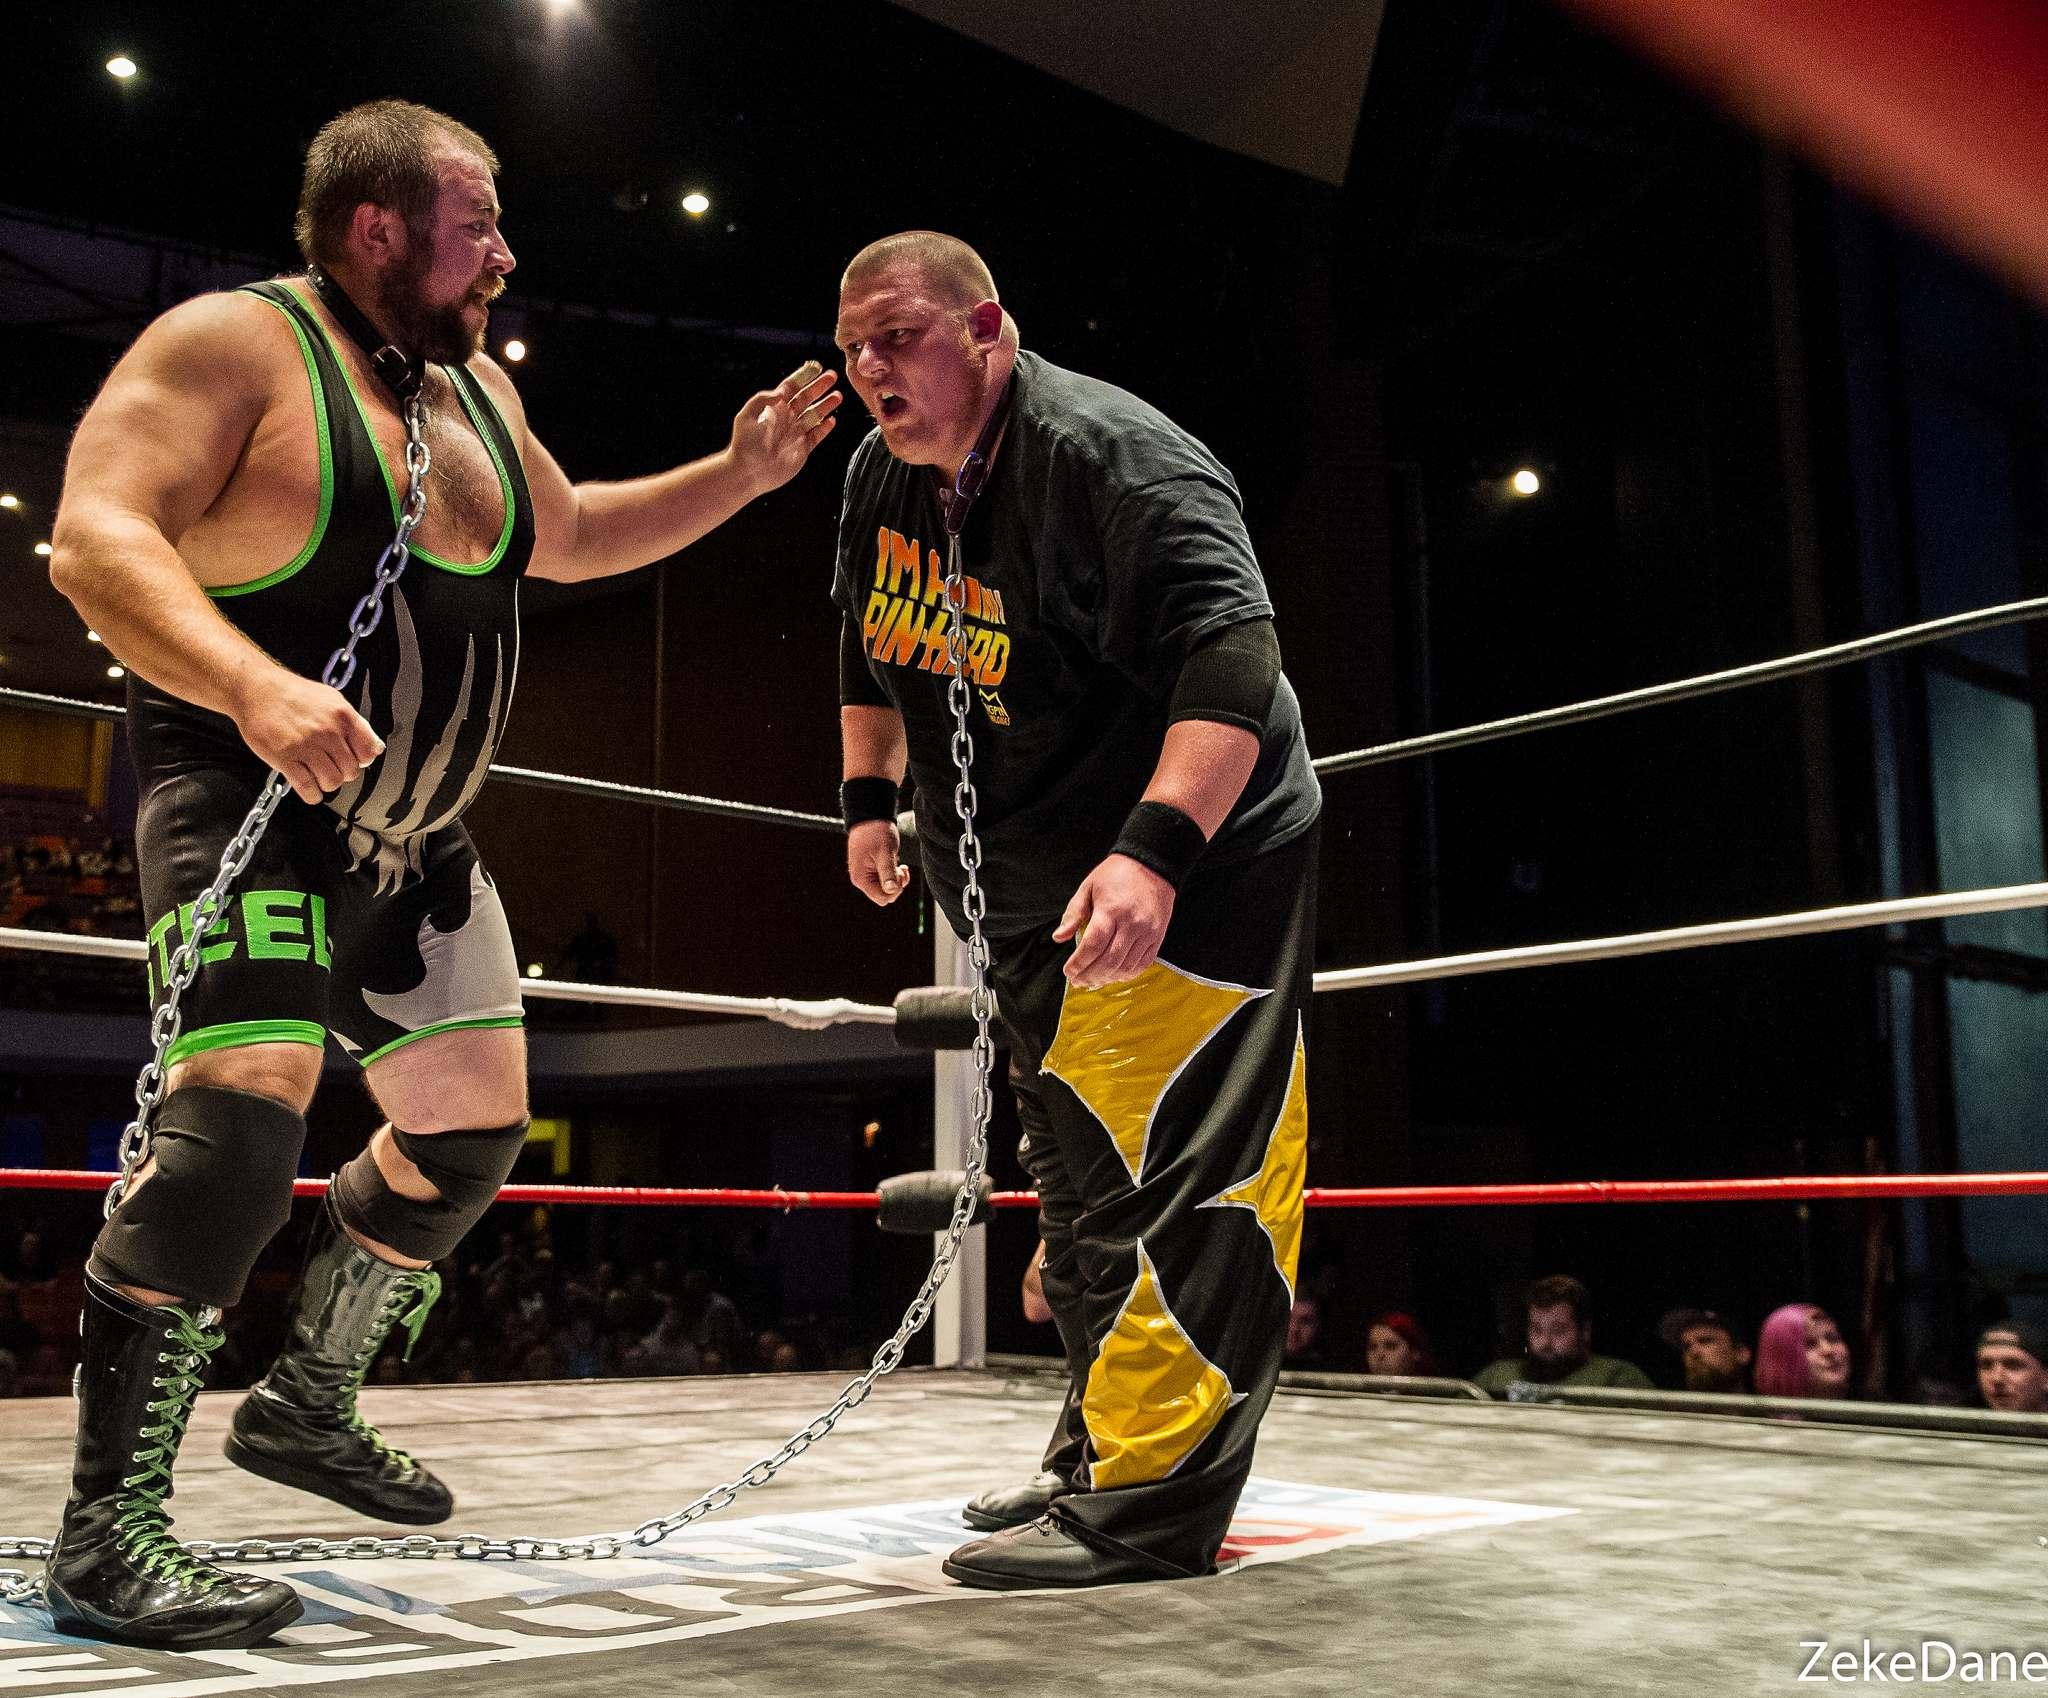 pro wrestling12 Pro Wrestling in New England 2016